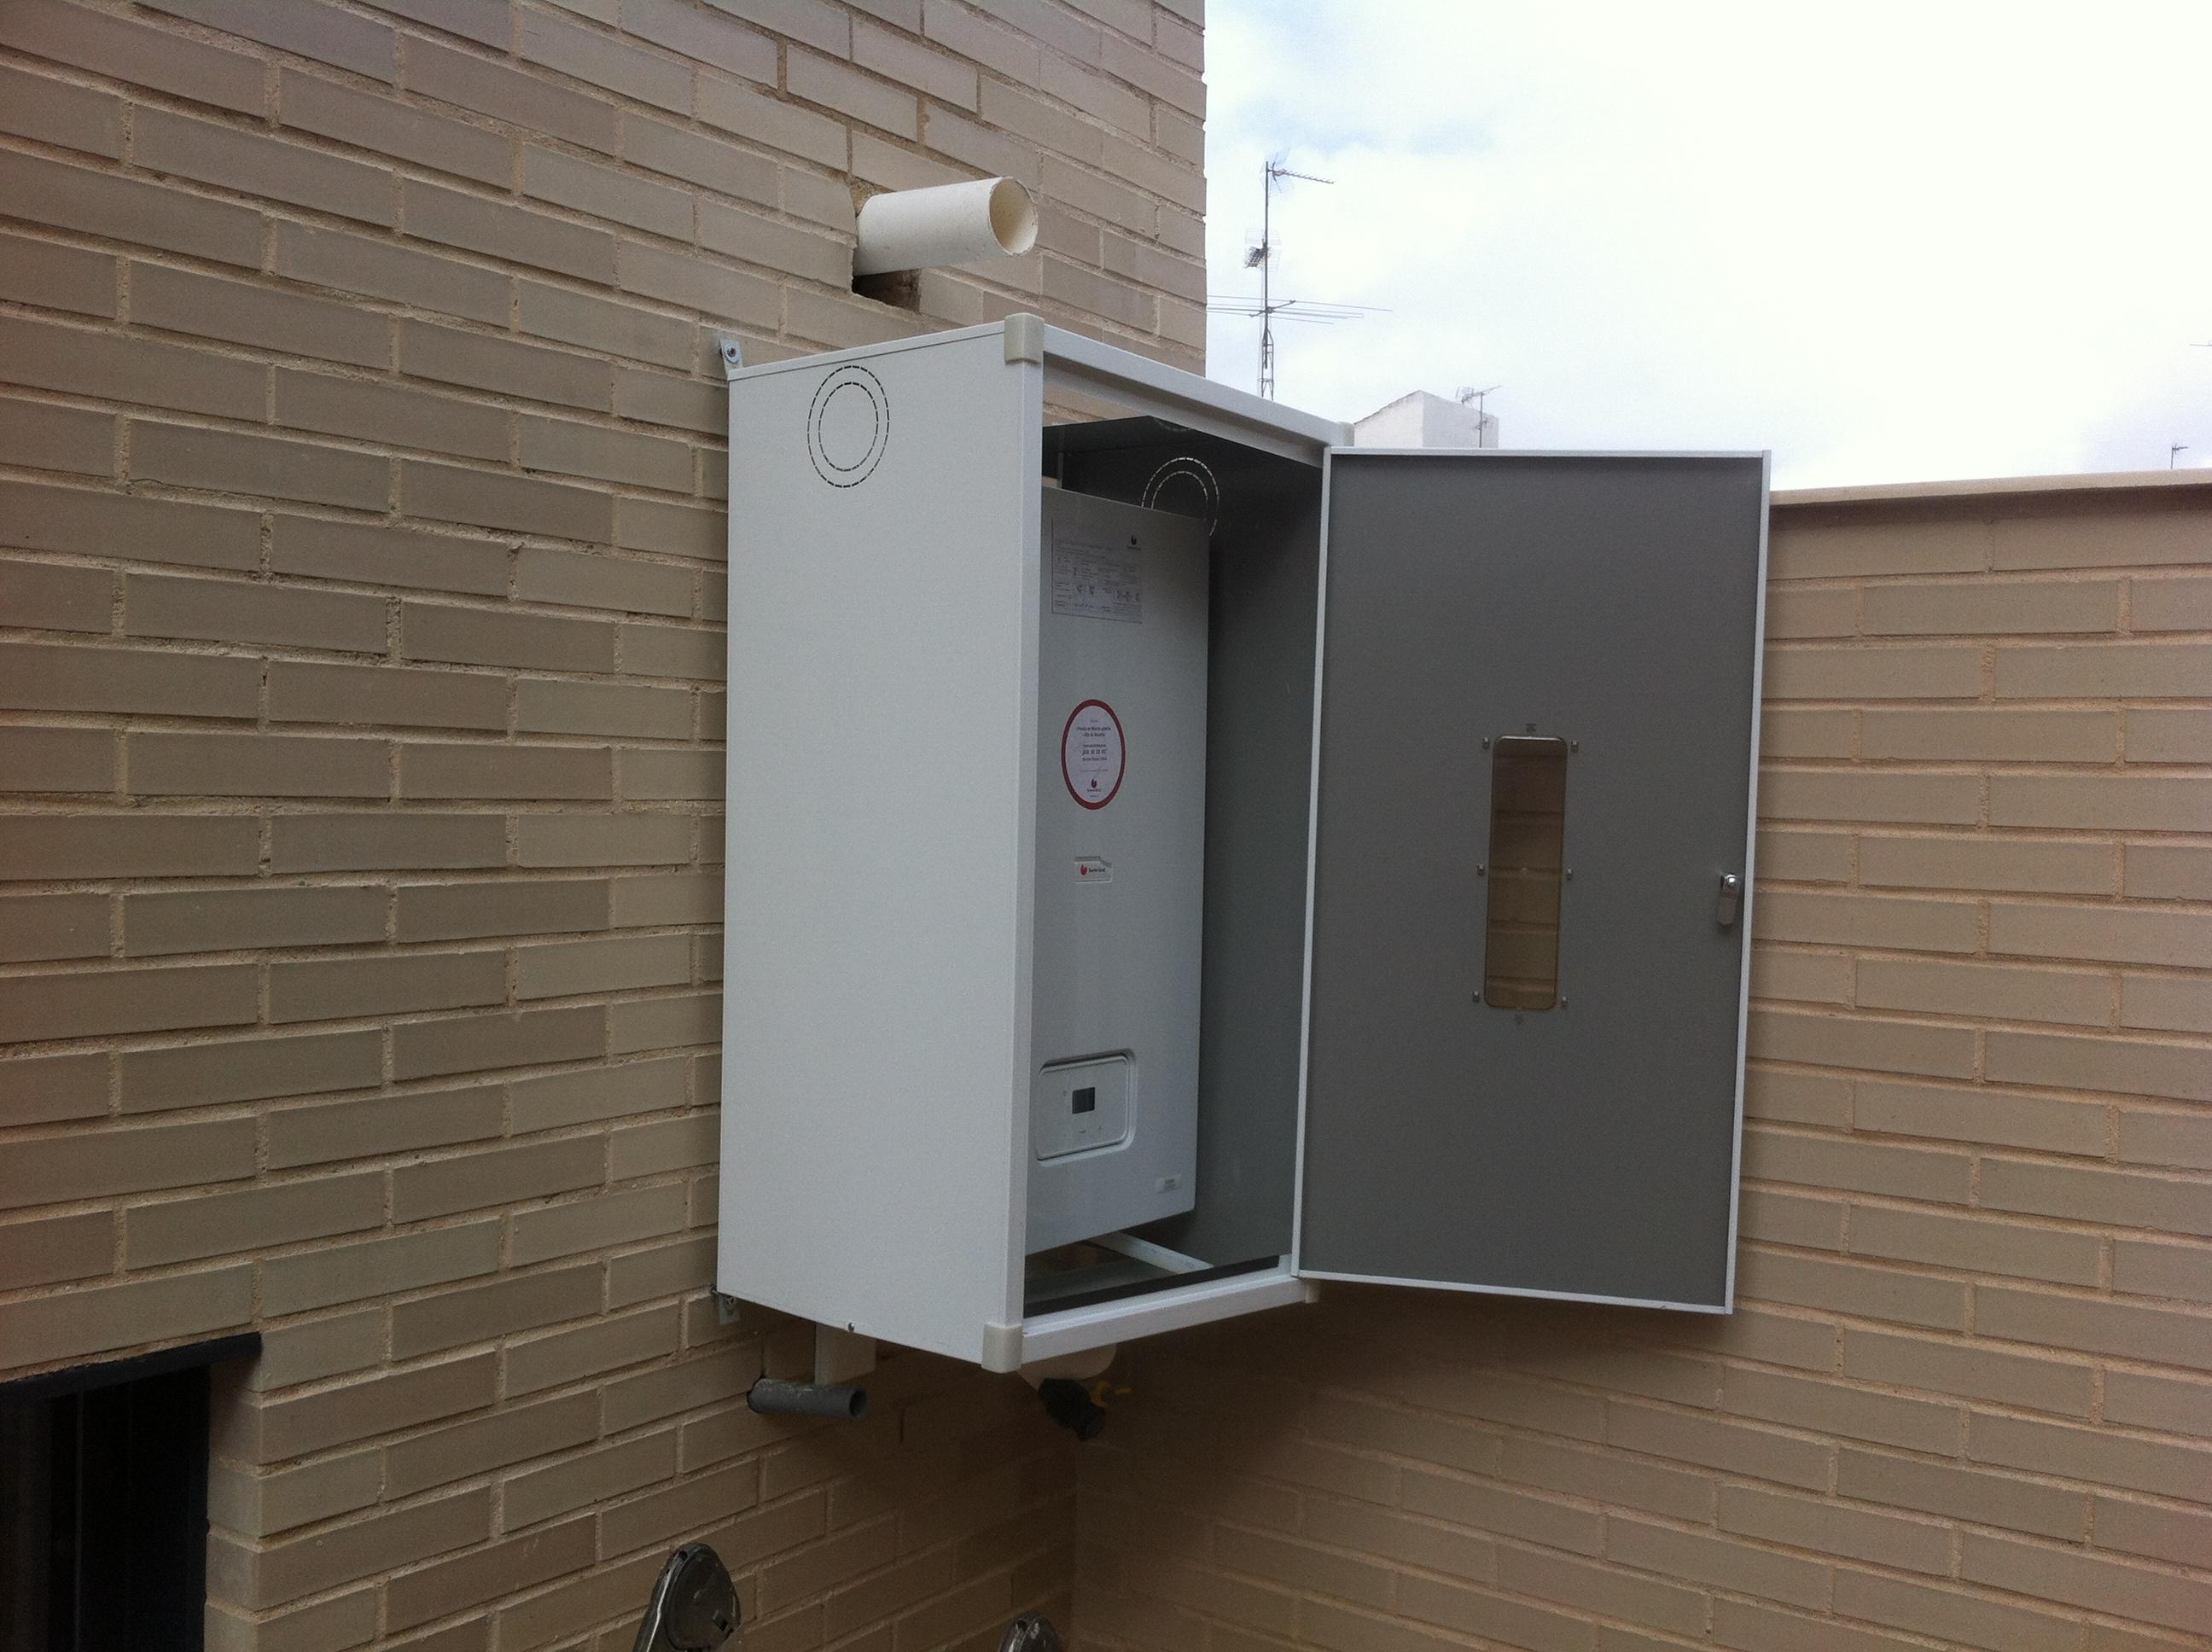 Armario caldera exterior gallery of fabricacin de armario para caldera exterior en aluminio - Armario para caldera exterior ...